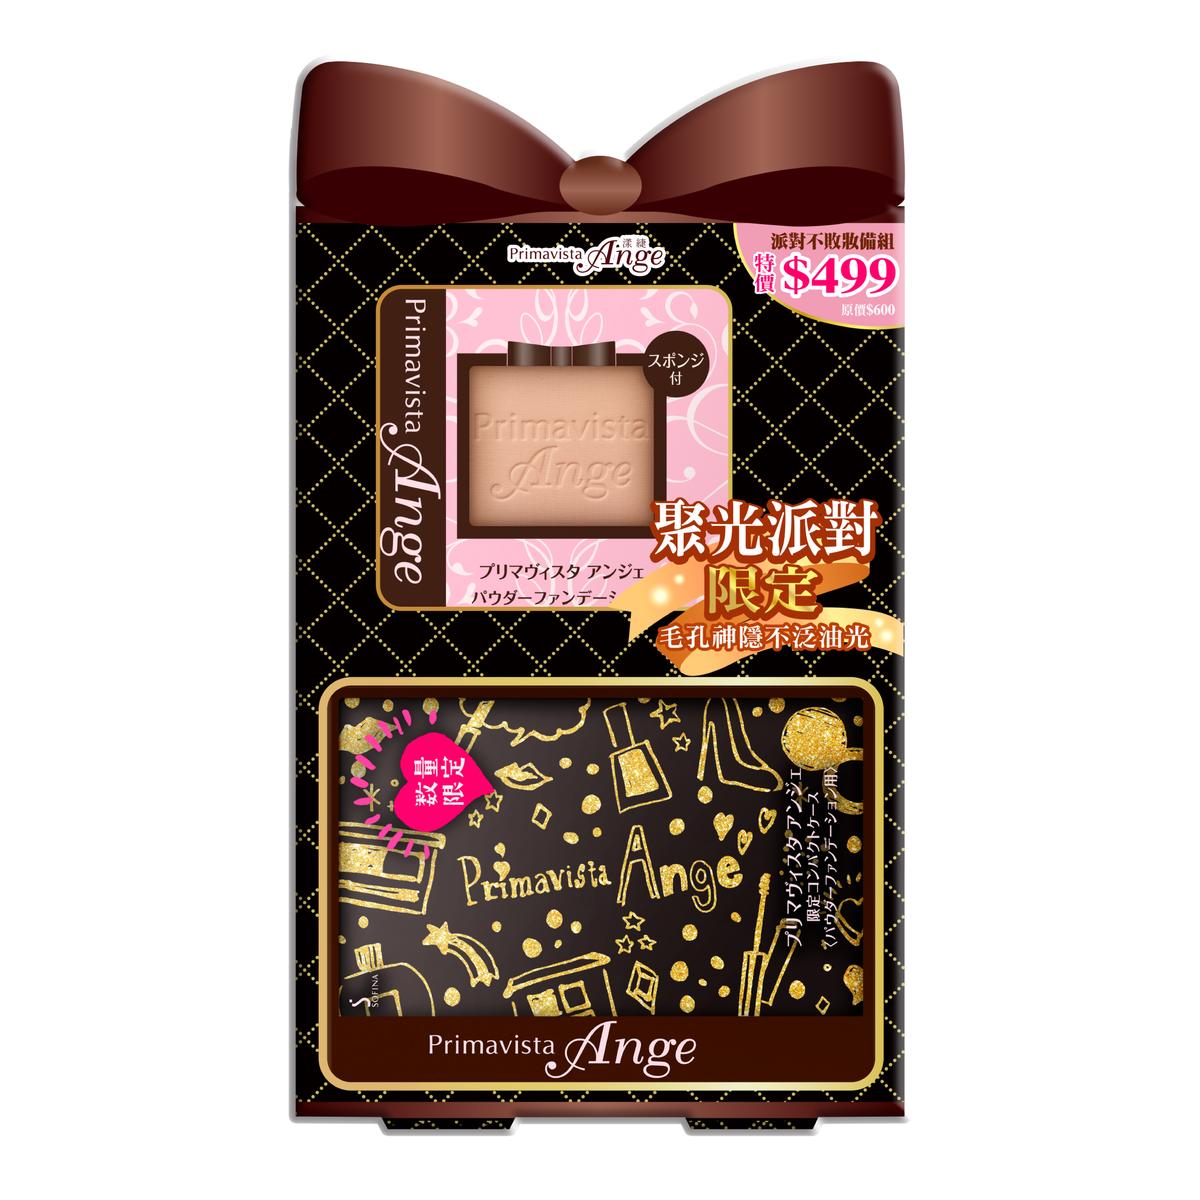 SOFINA 苏菲娜漾緁限量推出黑金调粉盒 时尚感秒飙升绝对成为派对焦点